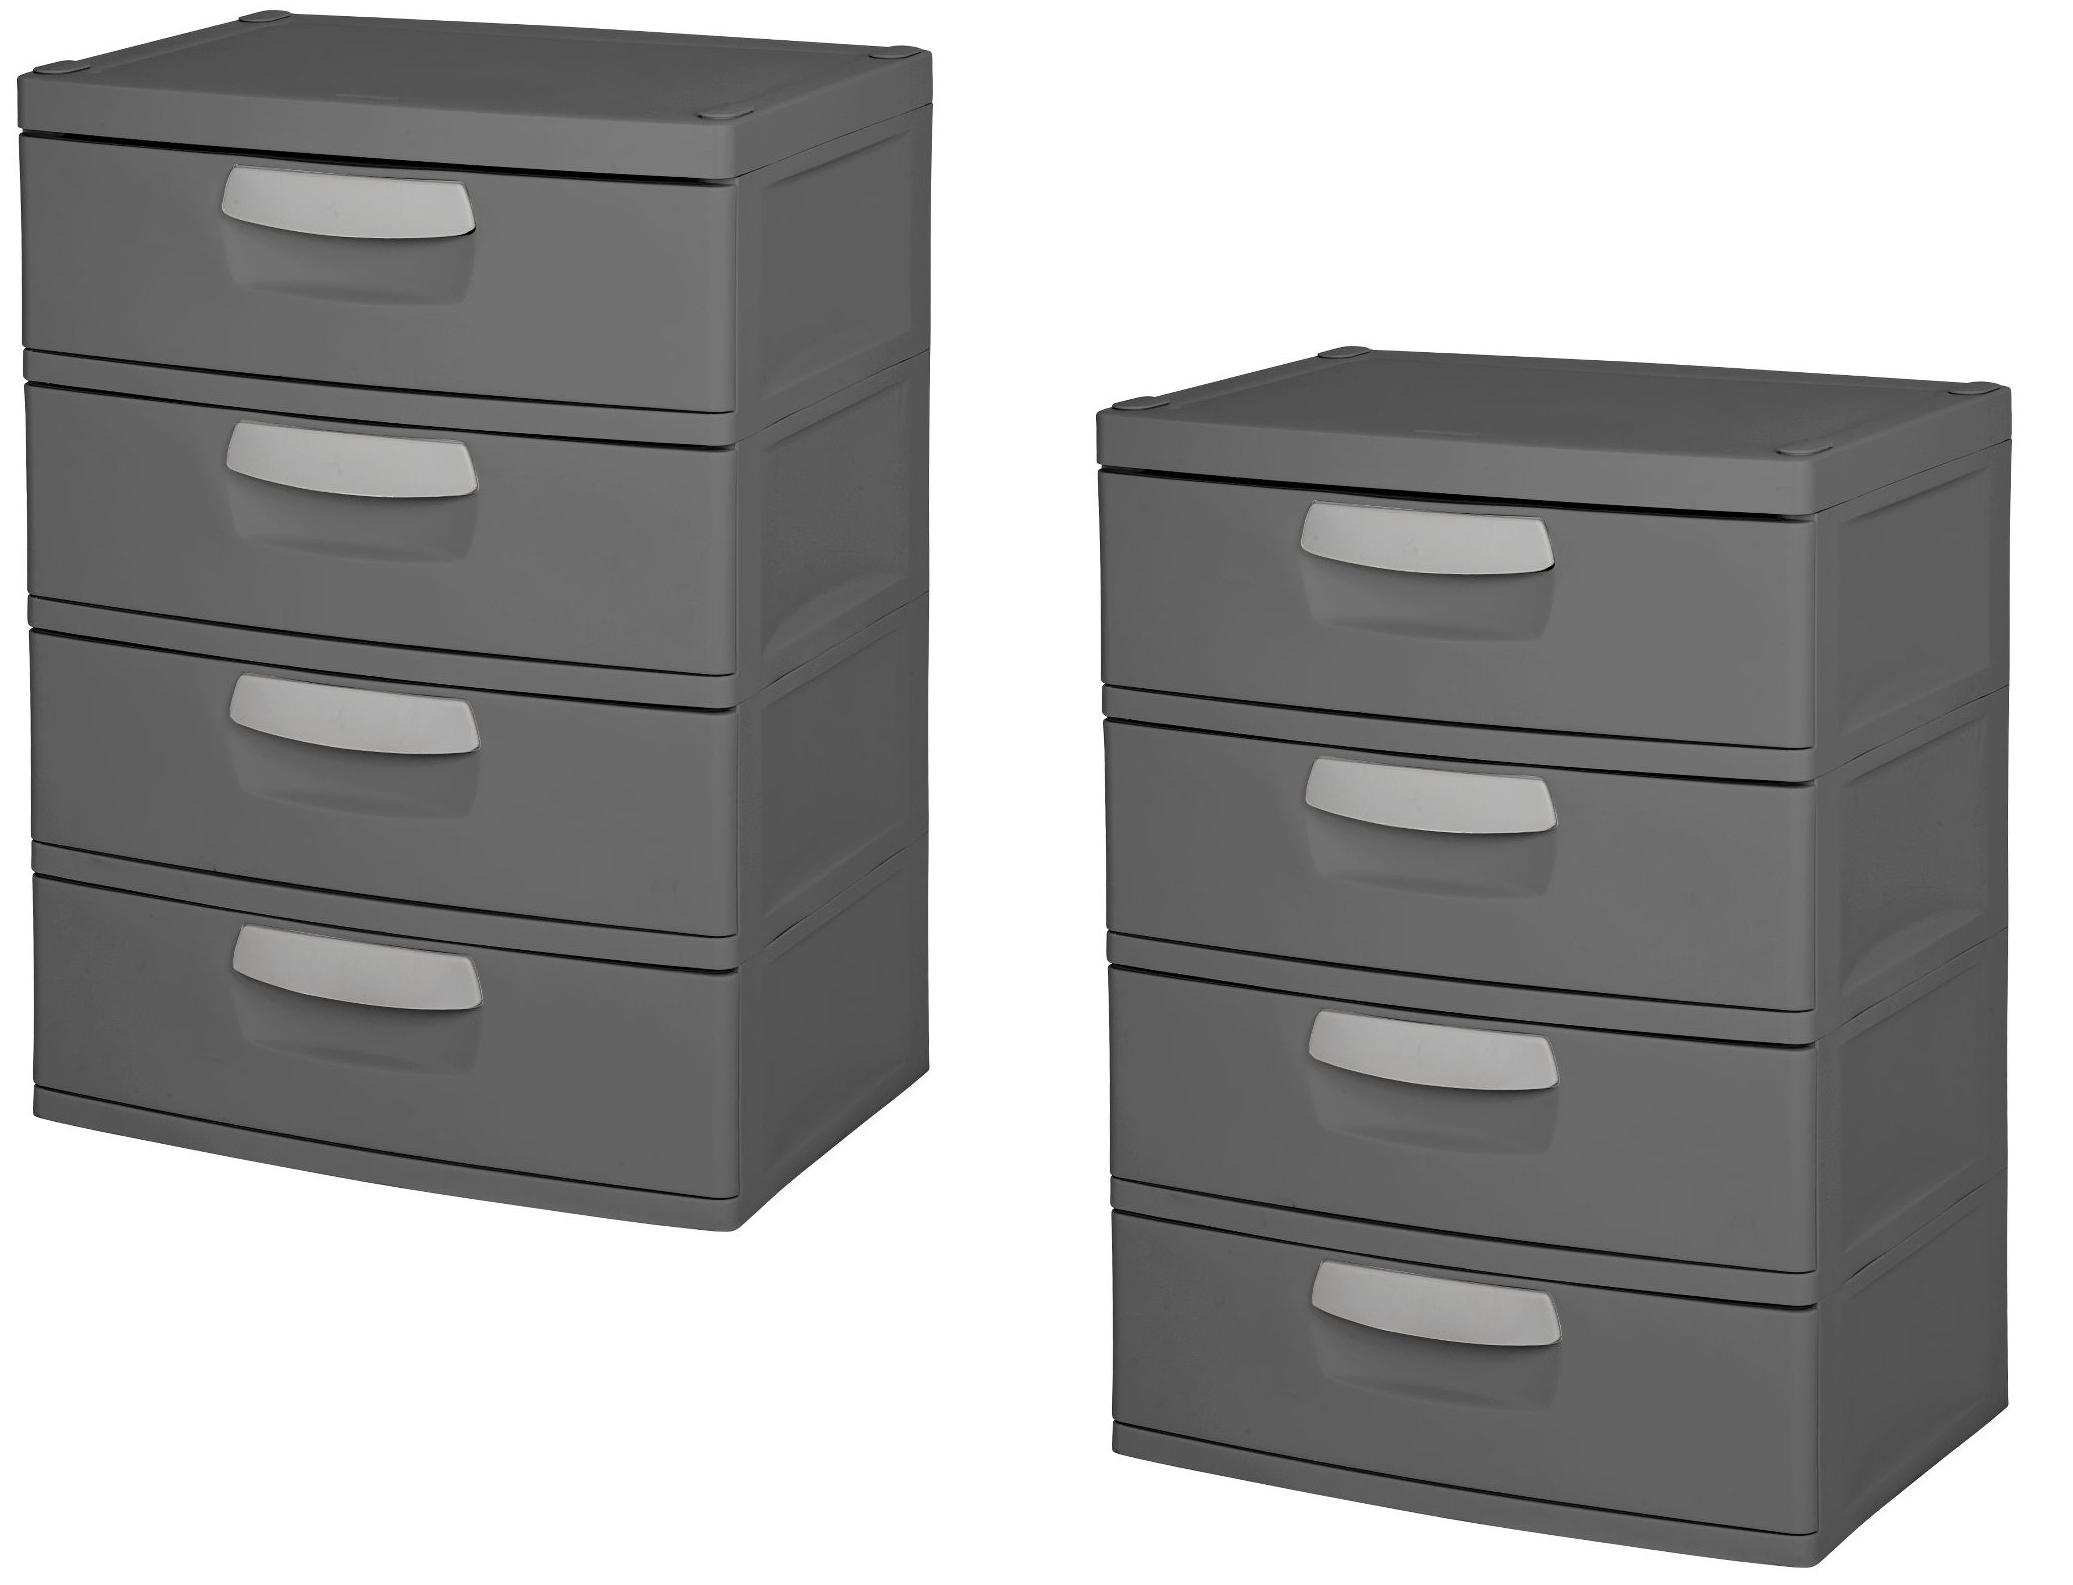 Fabulous Sterilite 4 Drawer Garage And Utility Storage Unit Download Free Architecture Designs Grimeyleaguecom